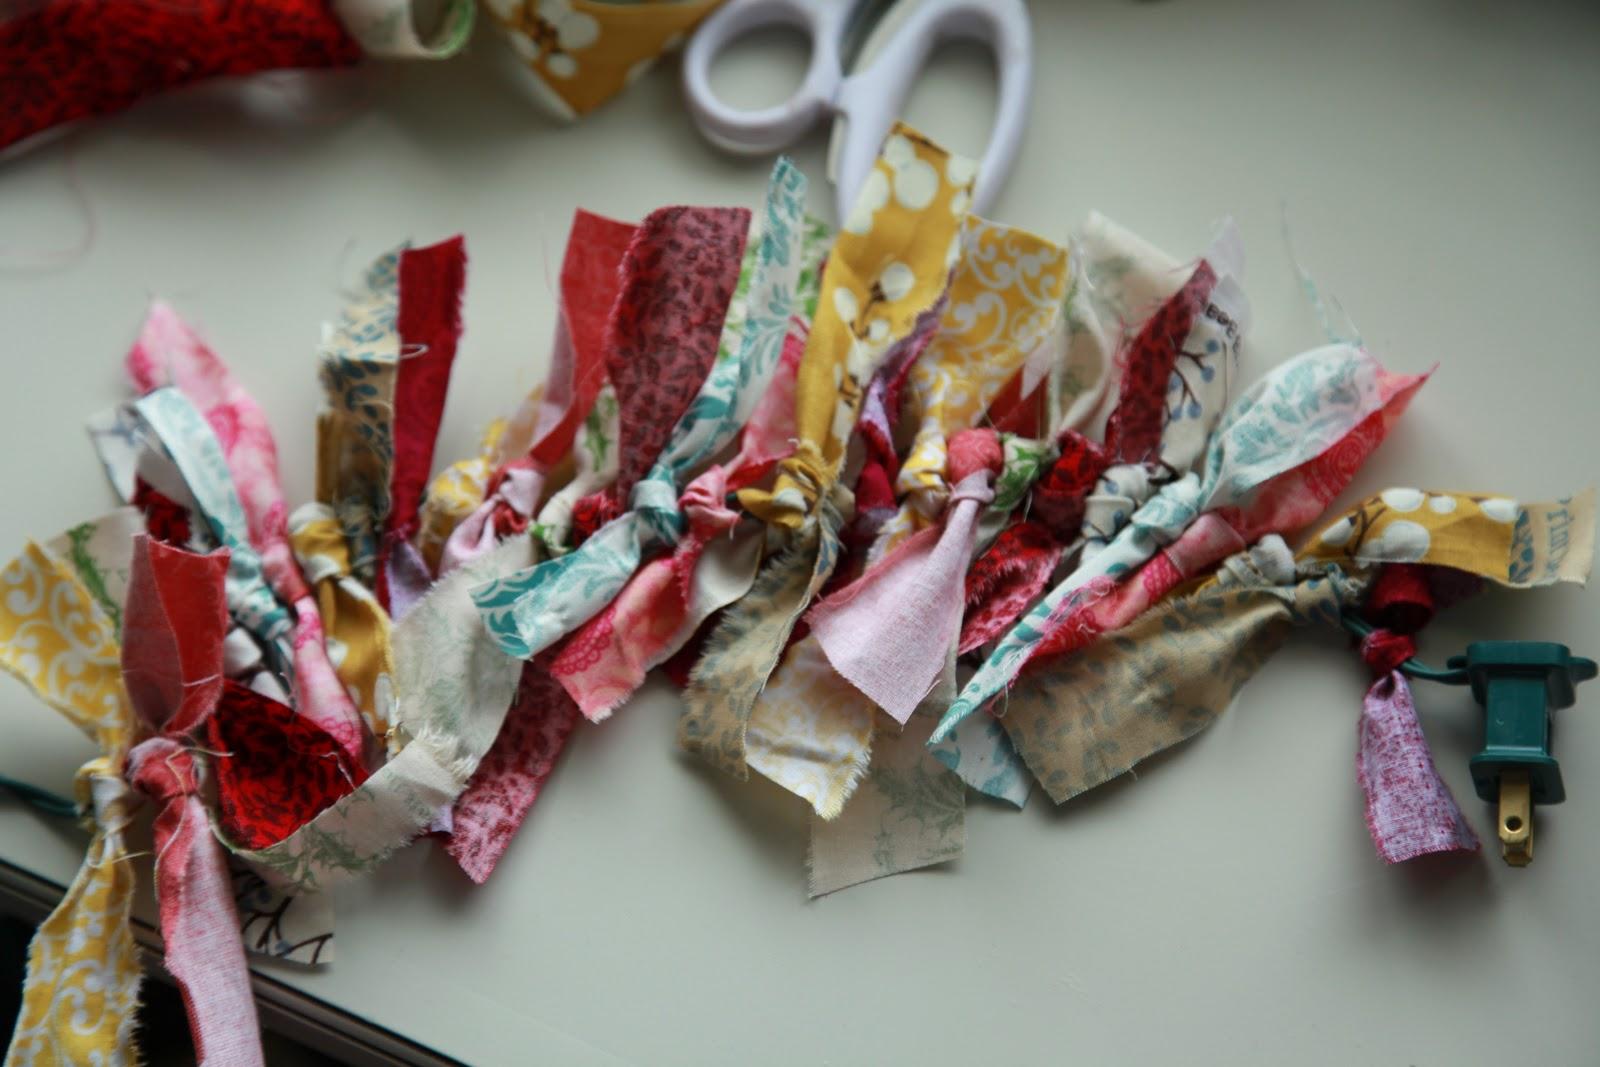 Christmas Fabric Craft Ideas Part - 41: December 10, 2011